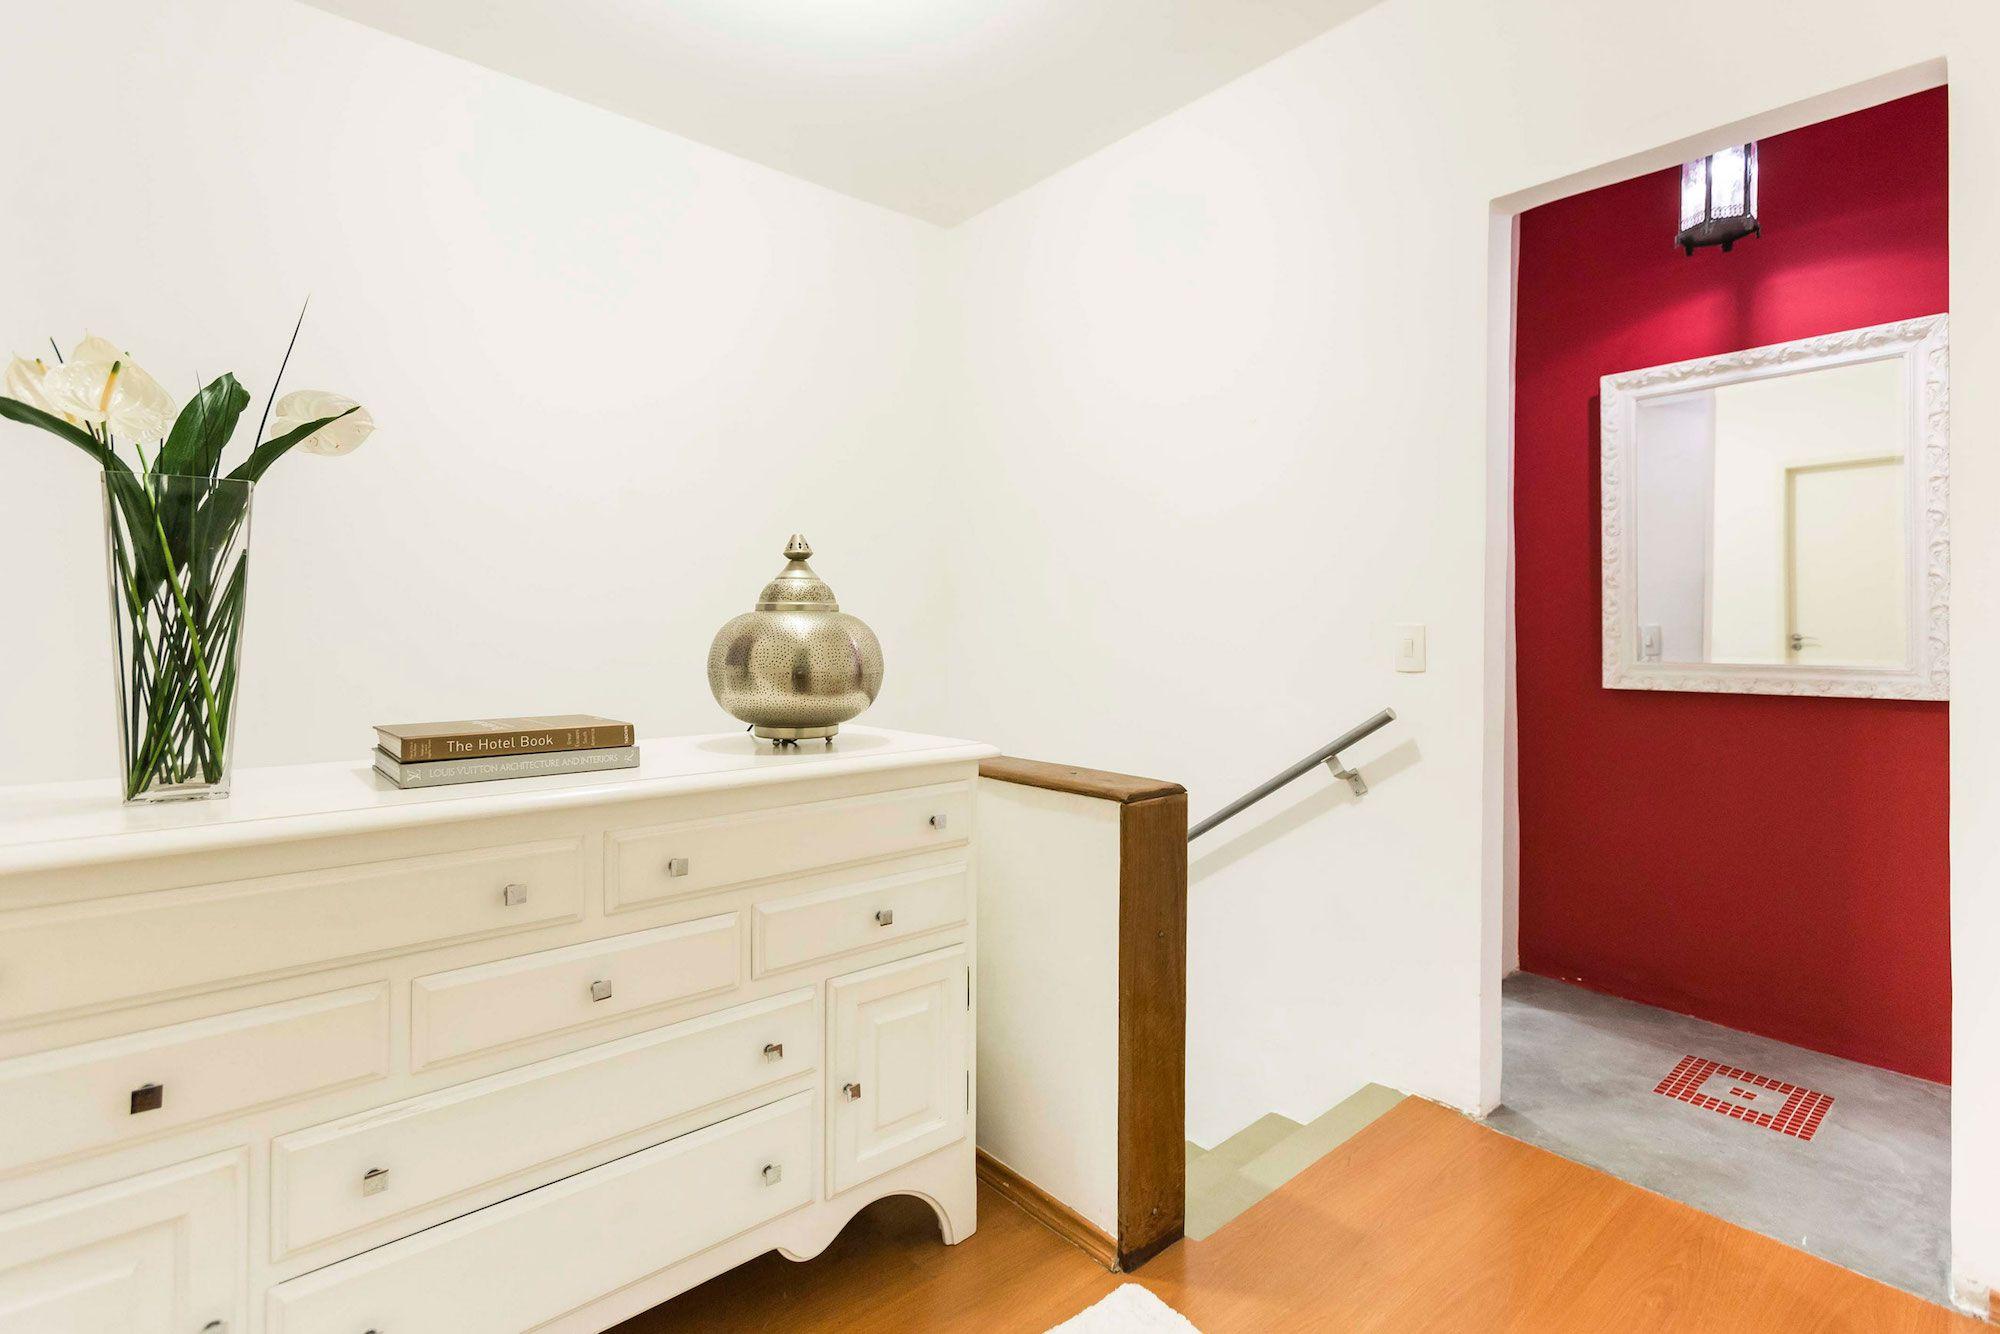 Granja-Julieta-Residence-26